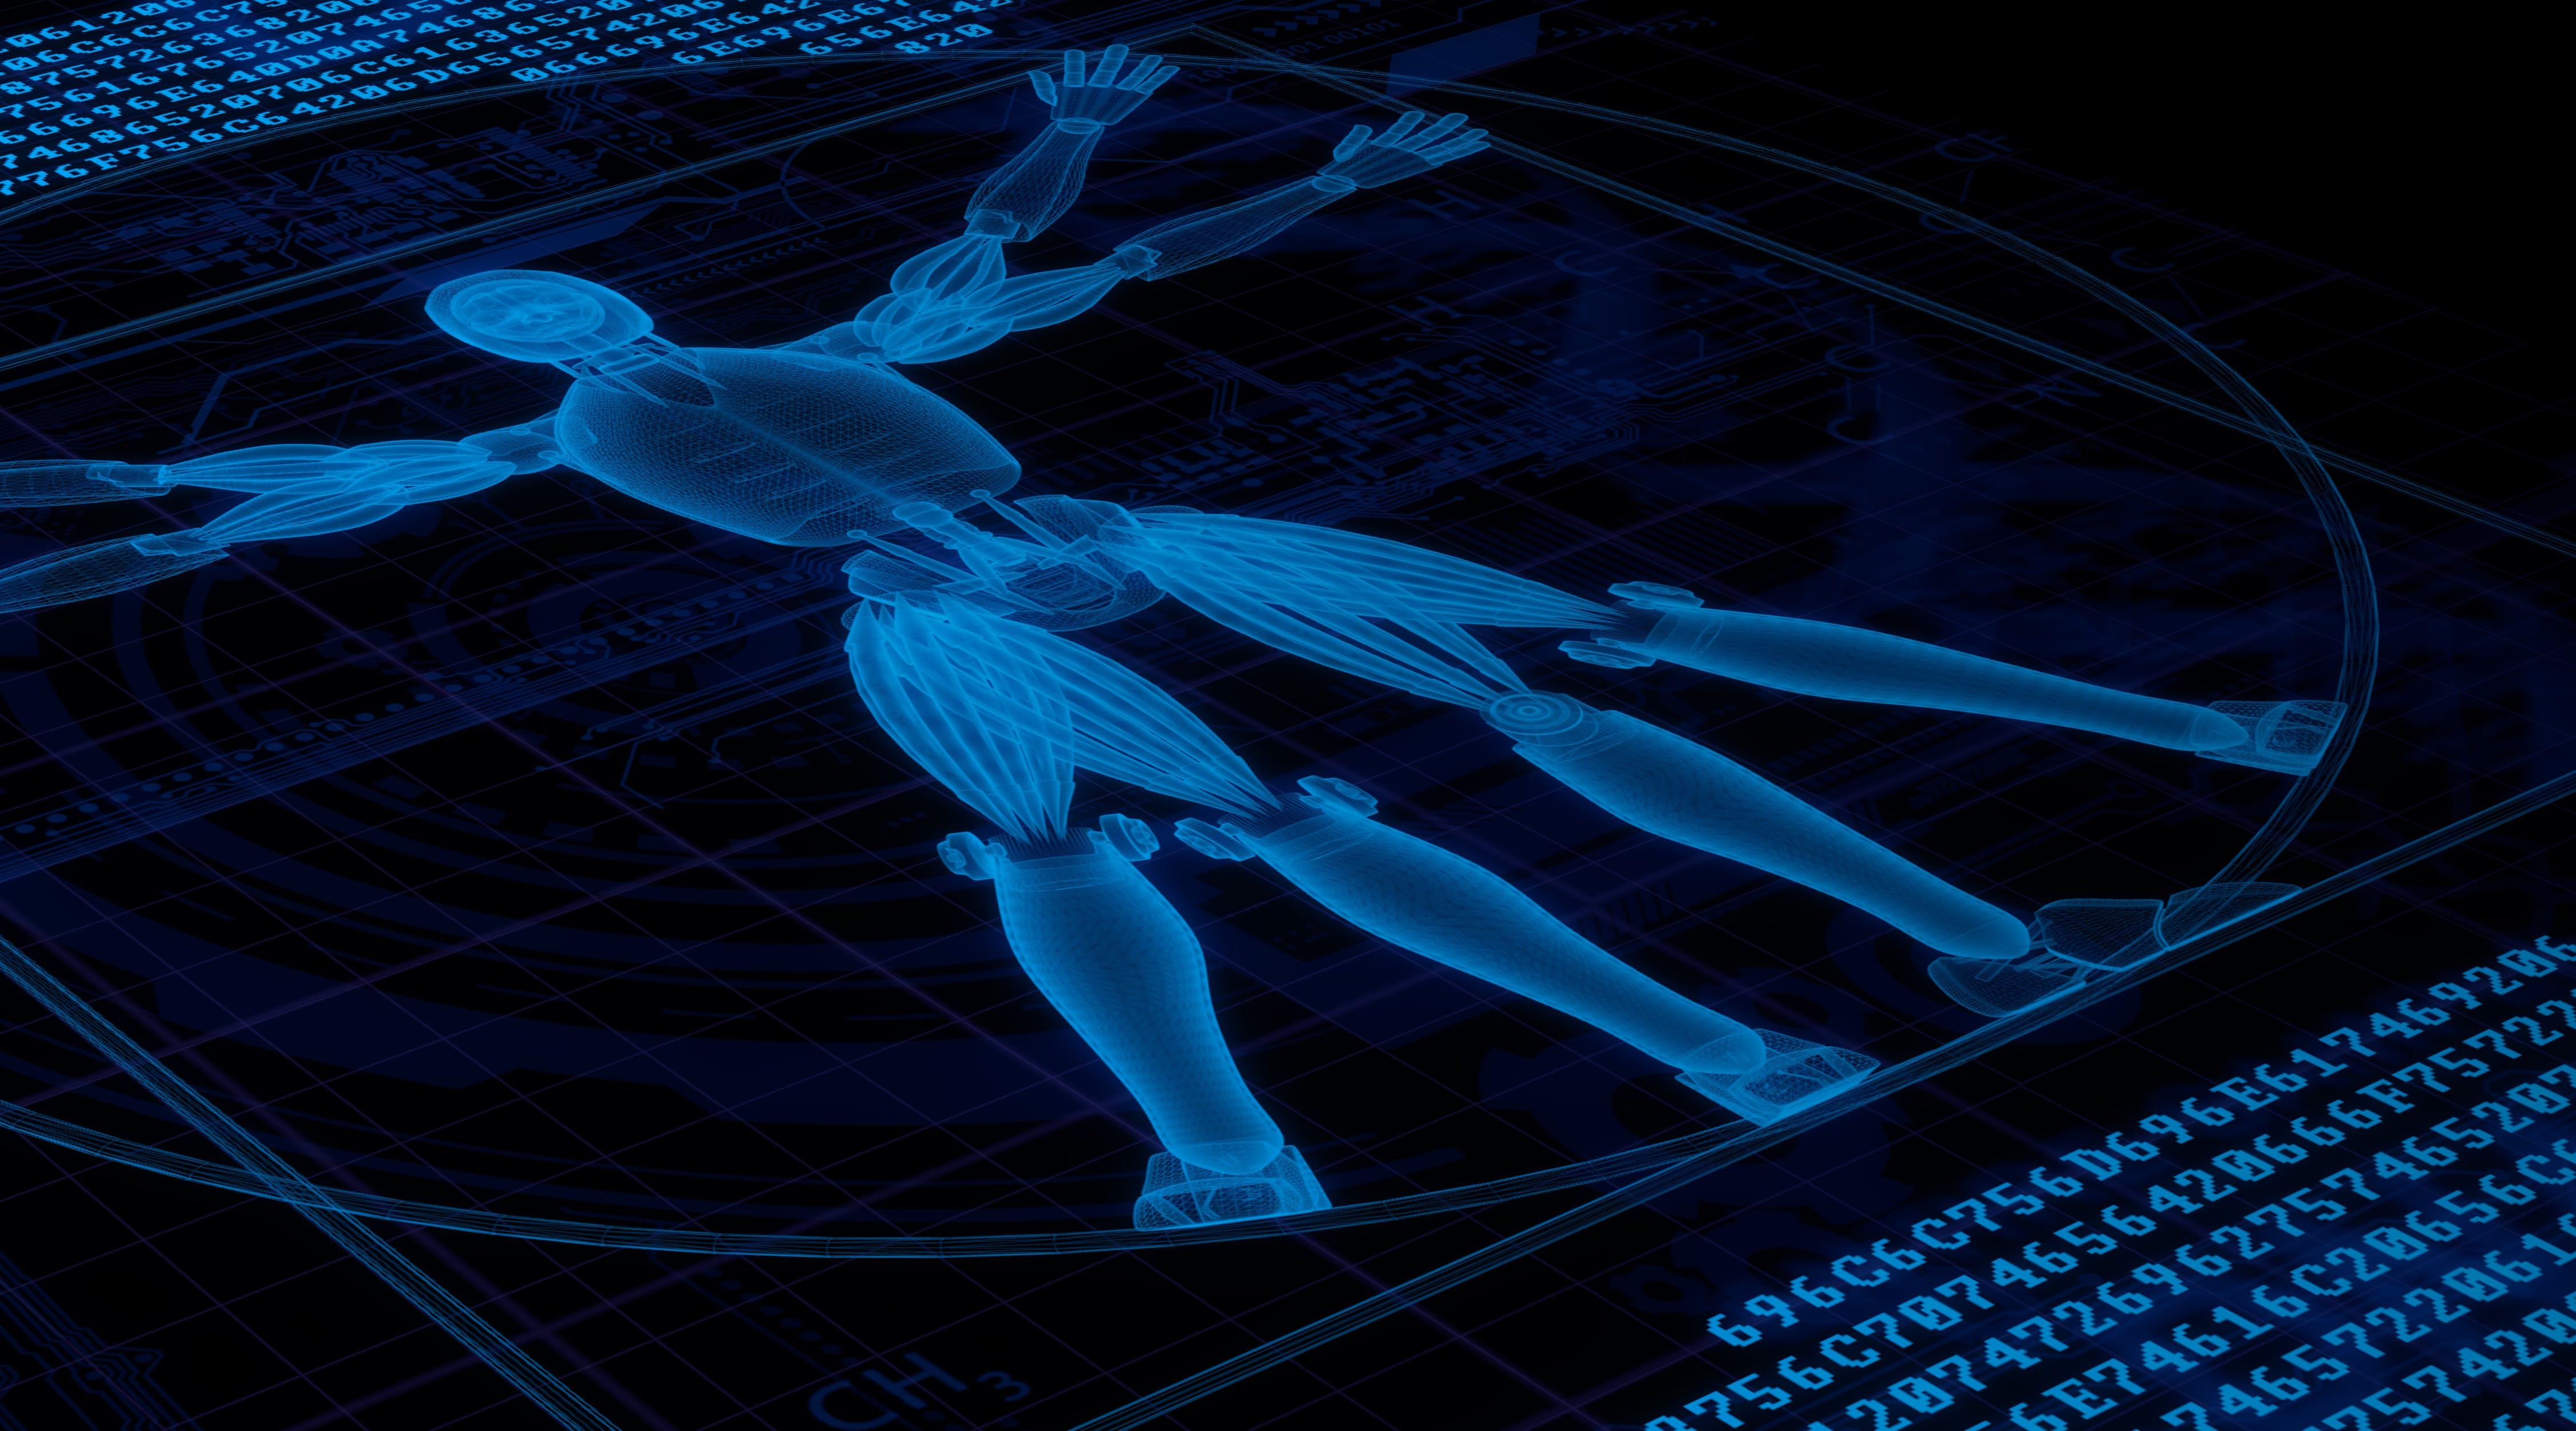 Gratis arkivbilde med 3d illustration, 3d rendering, anatomi, animatronic